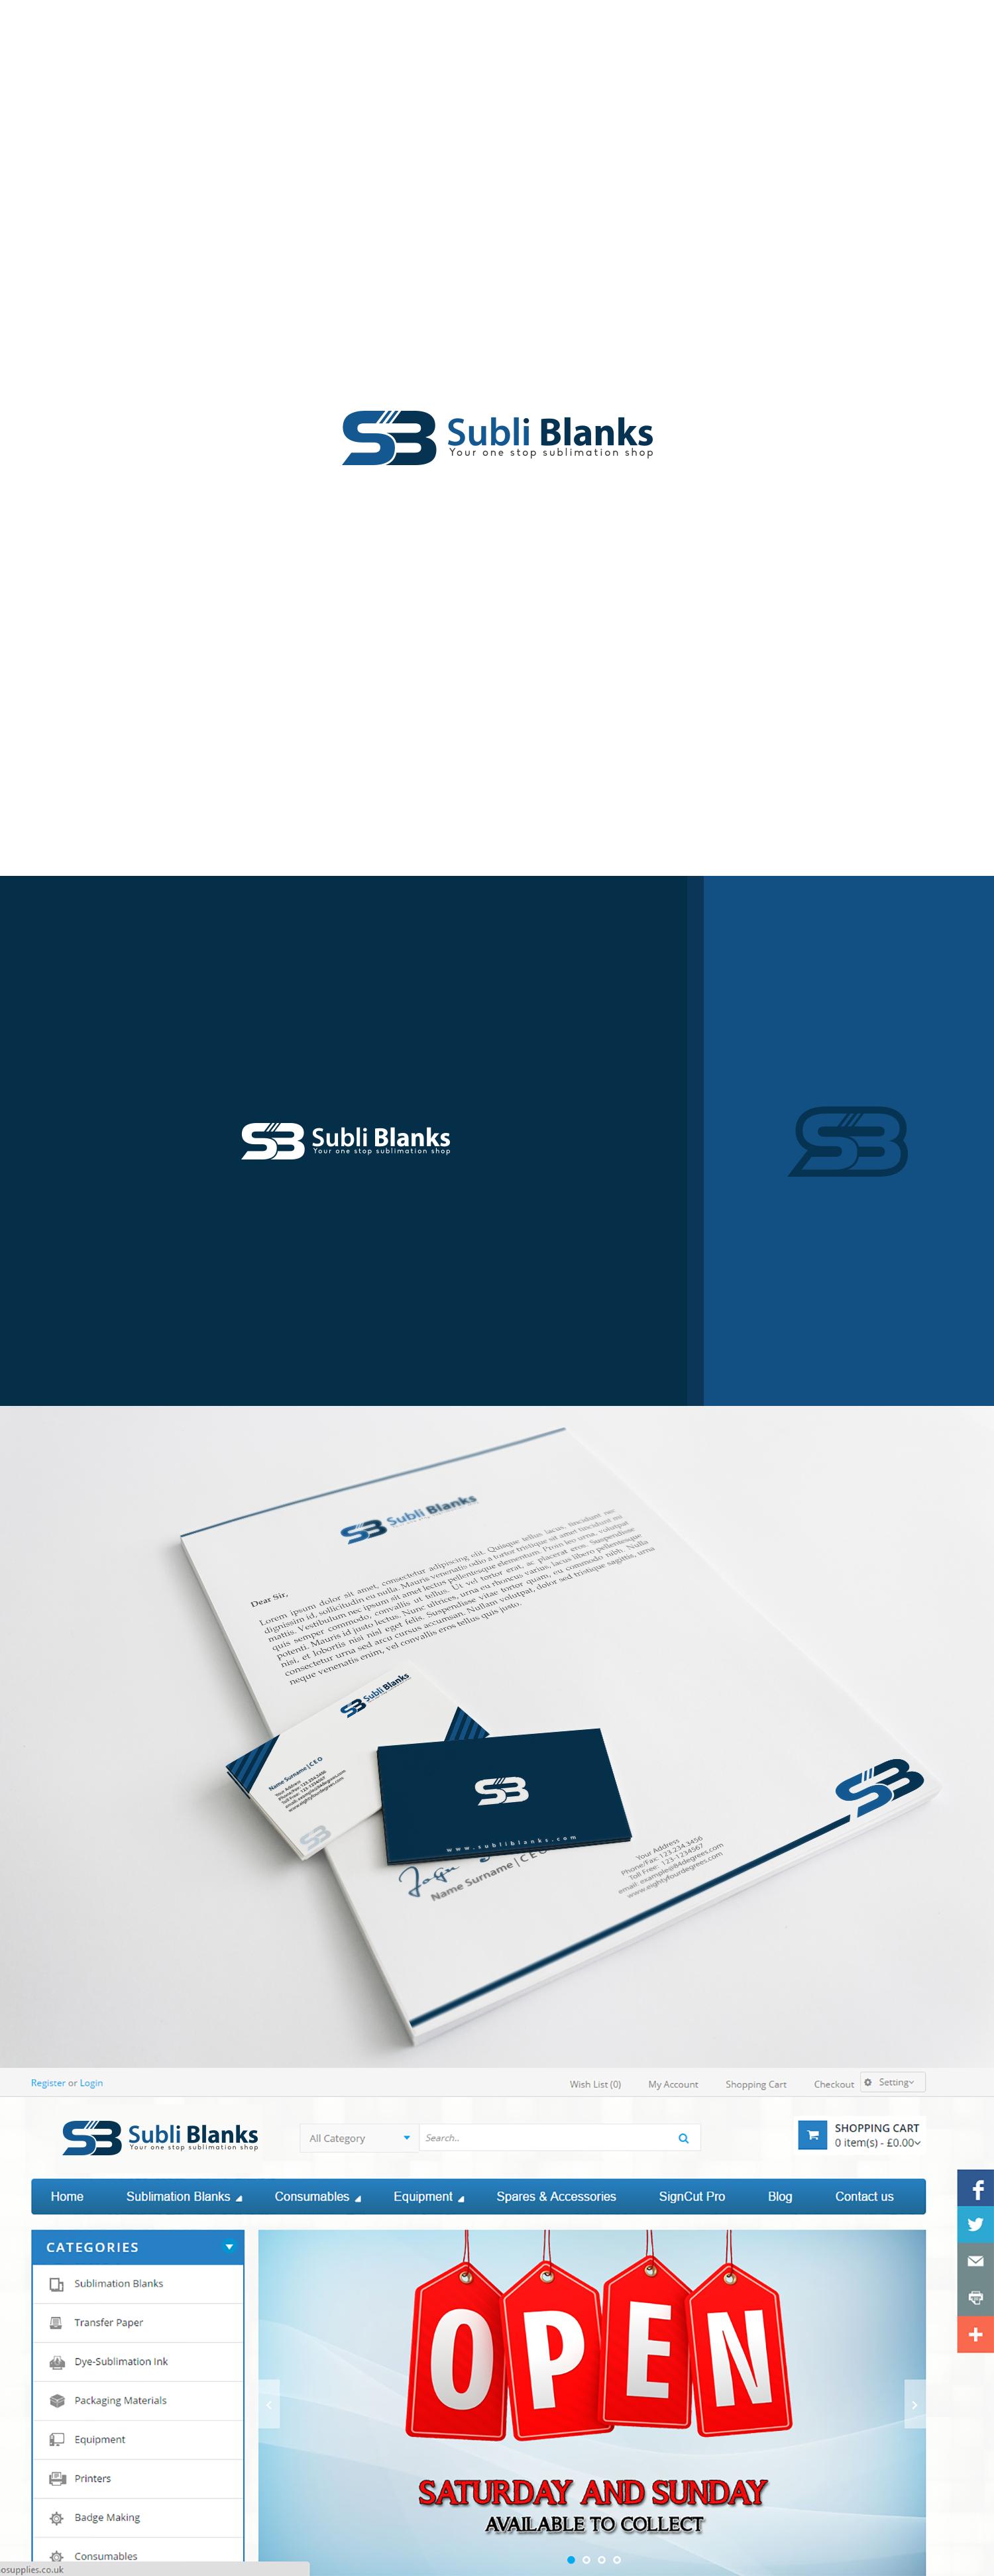 Create  professional impressive logo for printing supply company